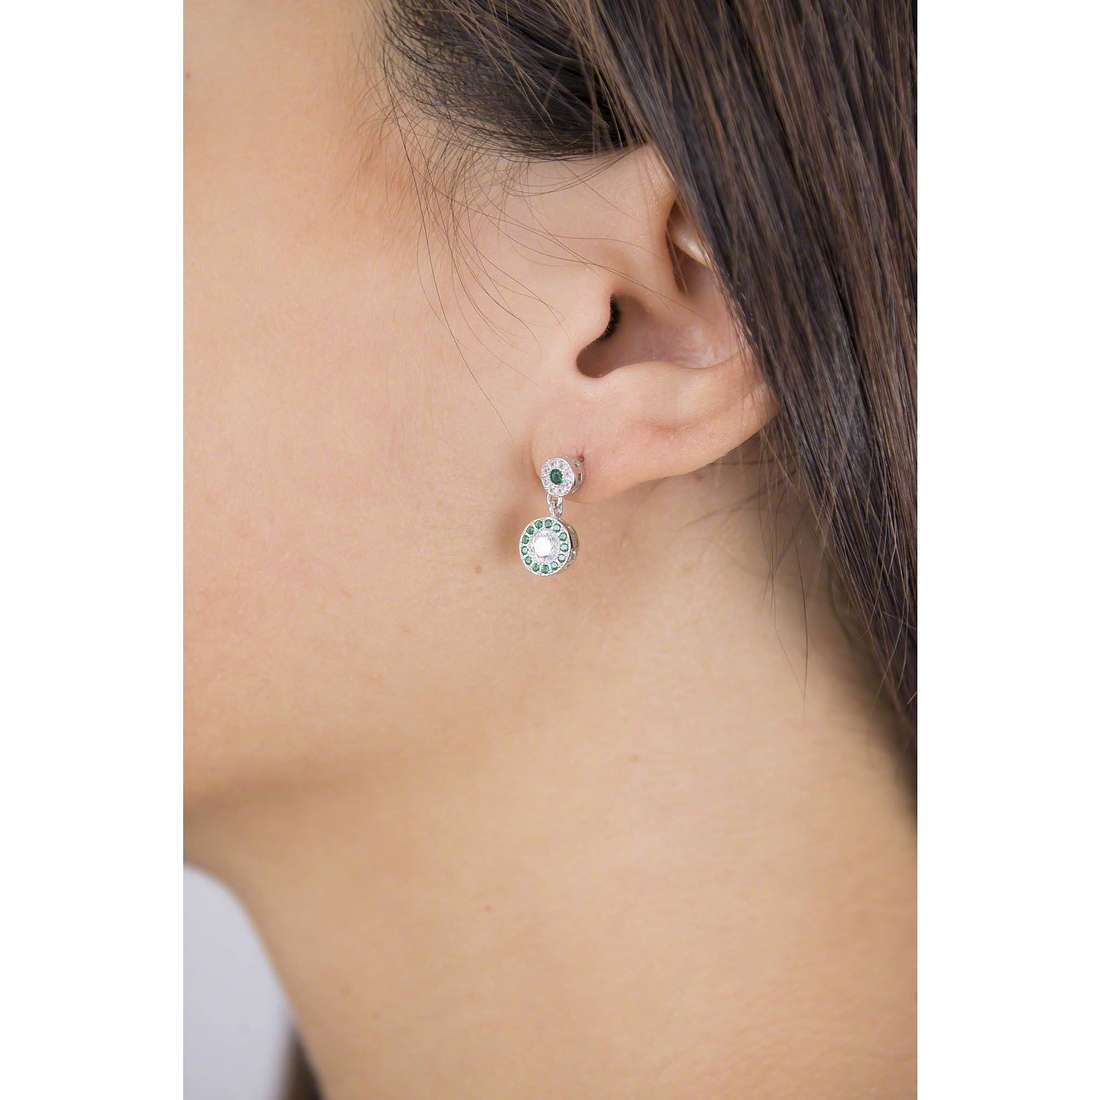 GioiaPura boucles d'oreille femme GPSRSOR2303-VE indosso